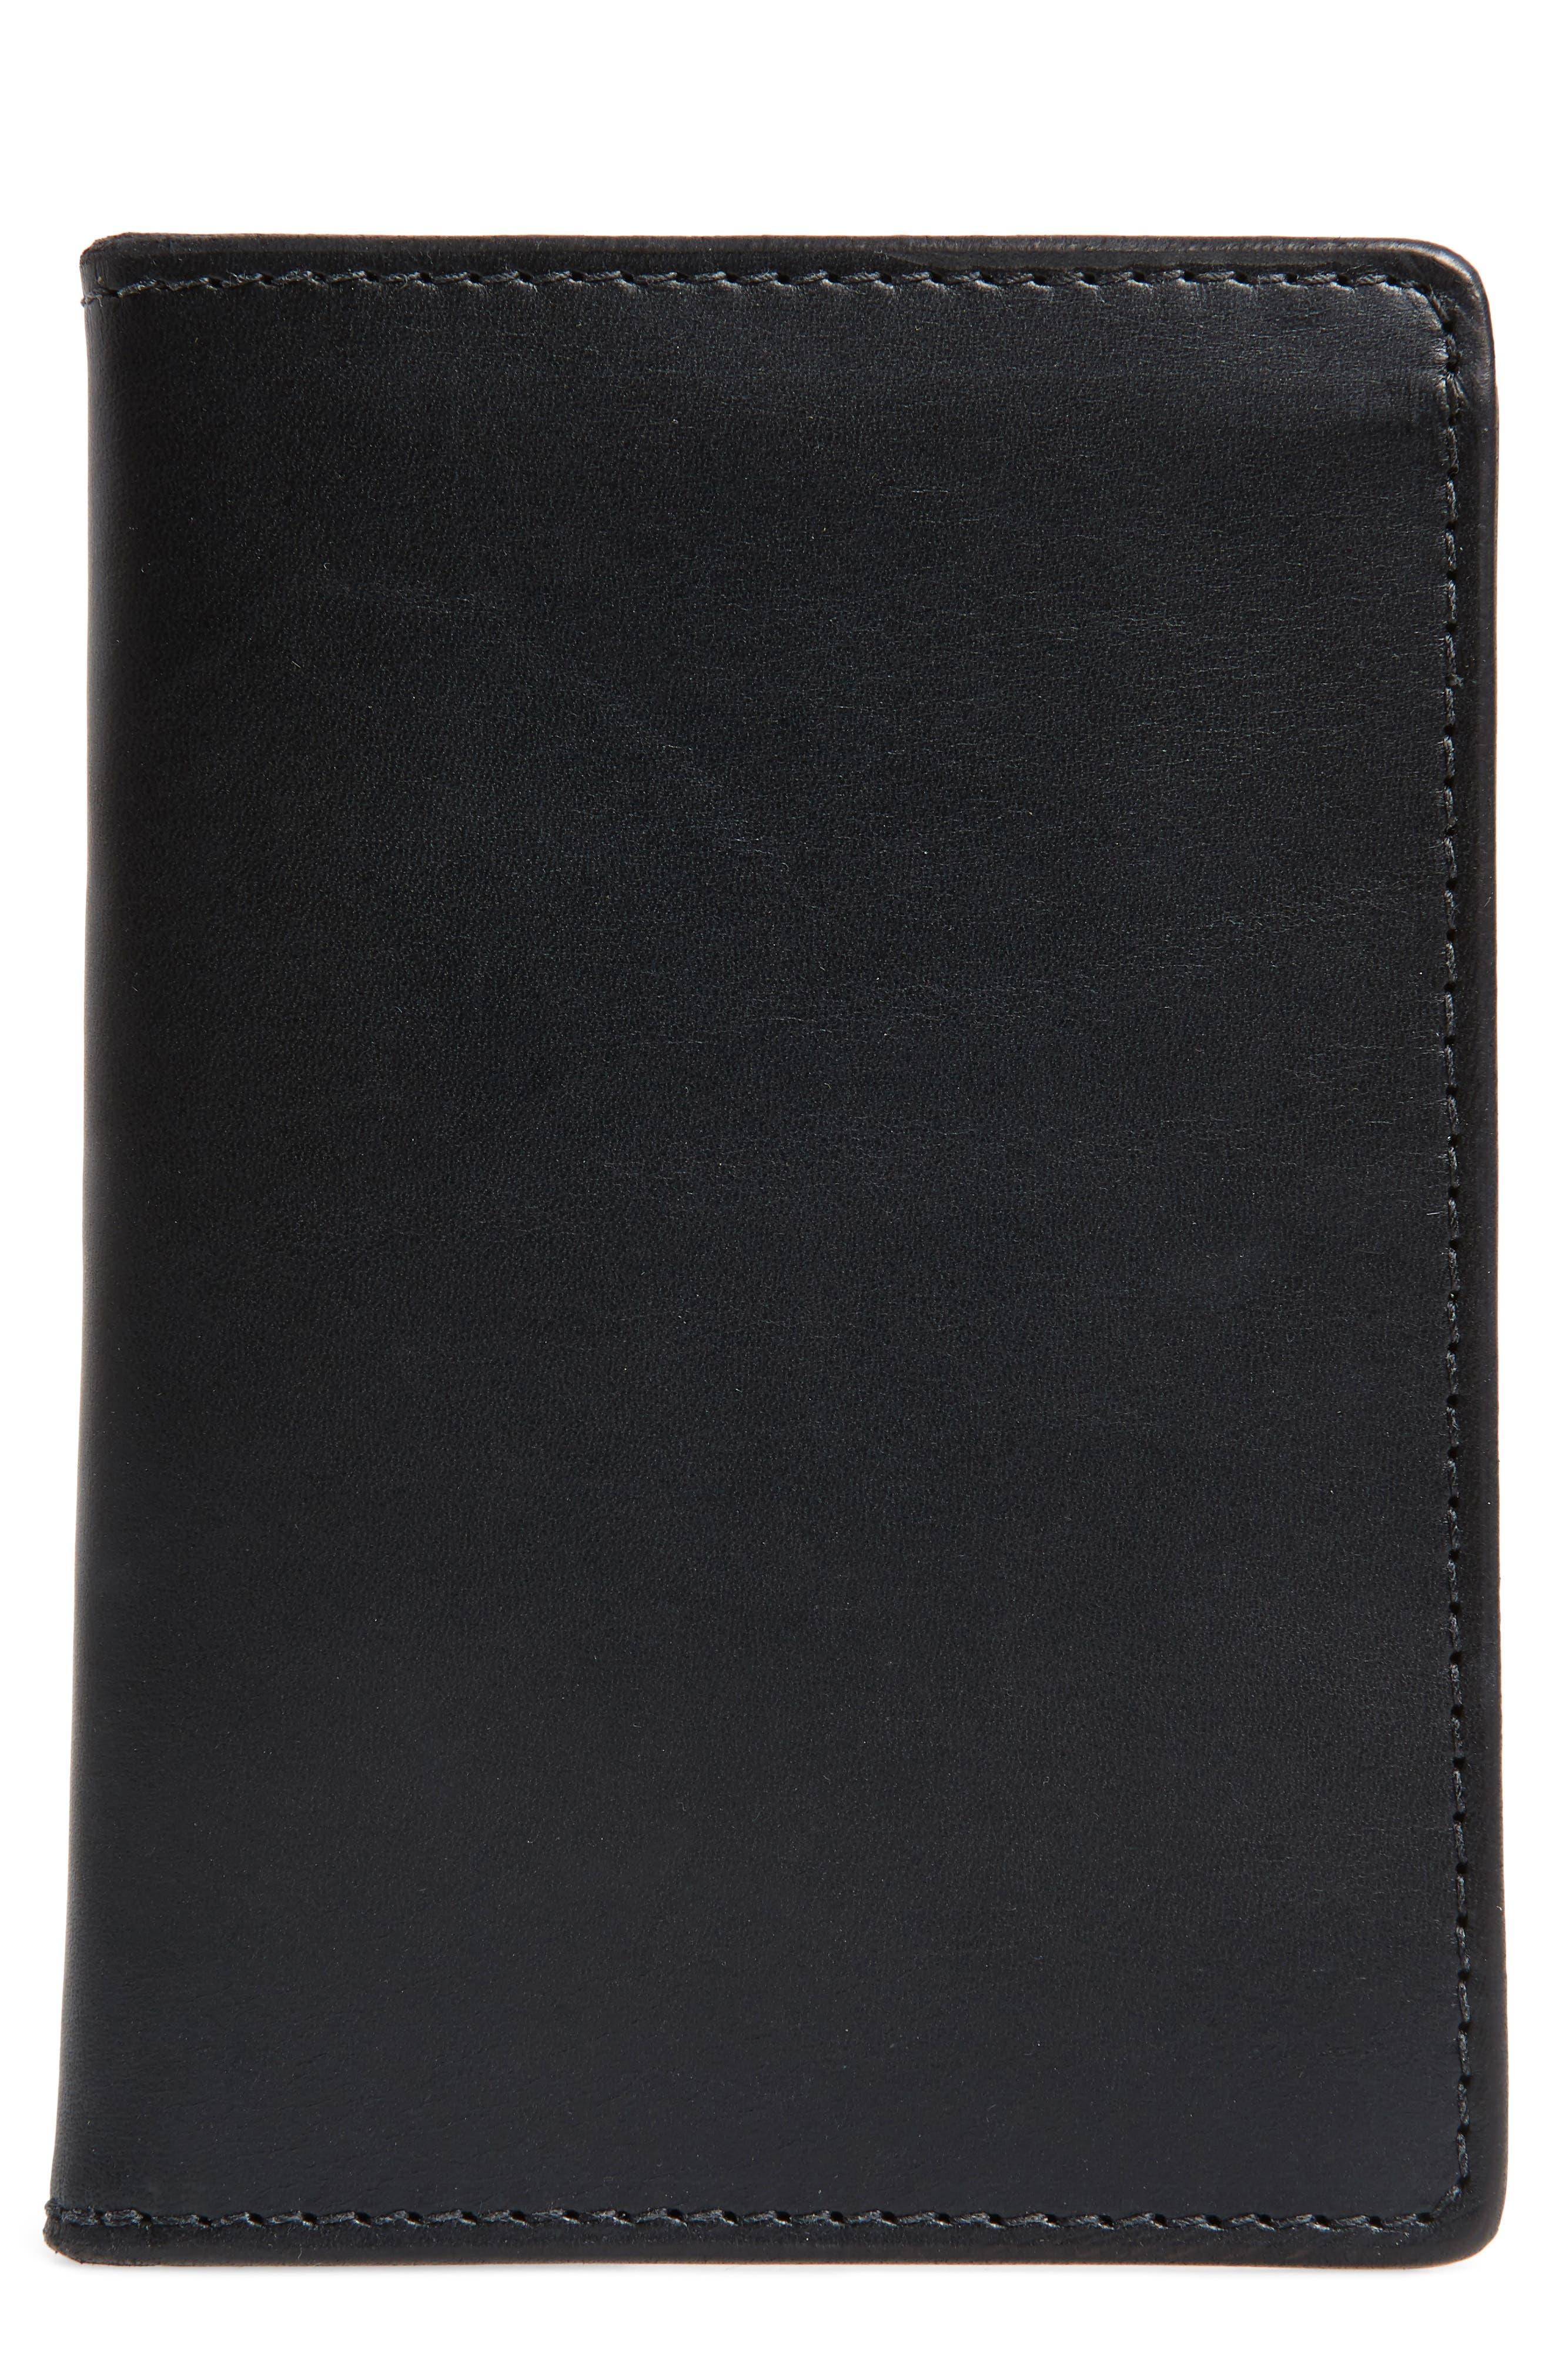 Leather Travel Wallet,                         Main,                         color, Black